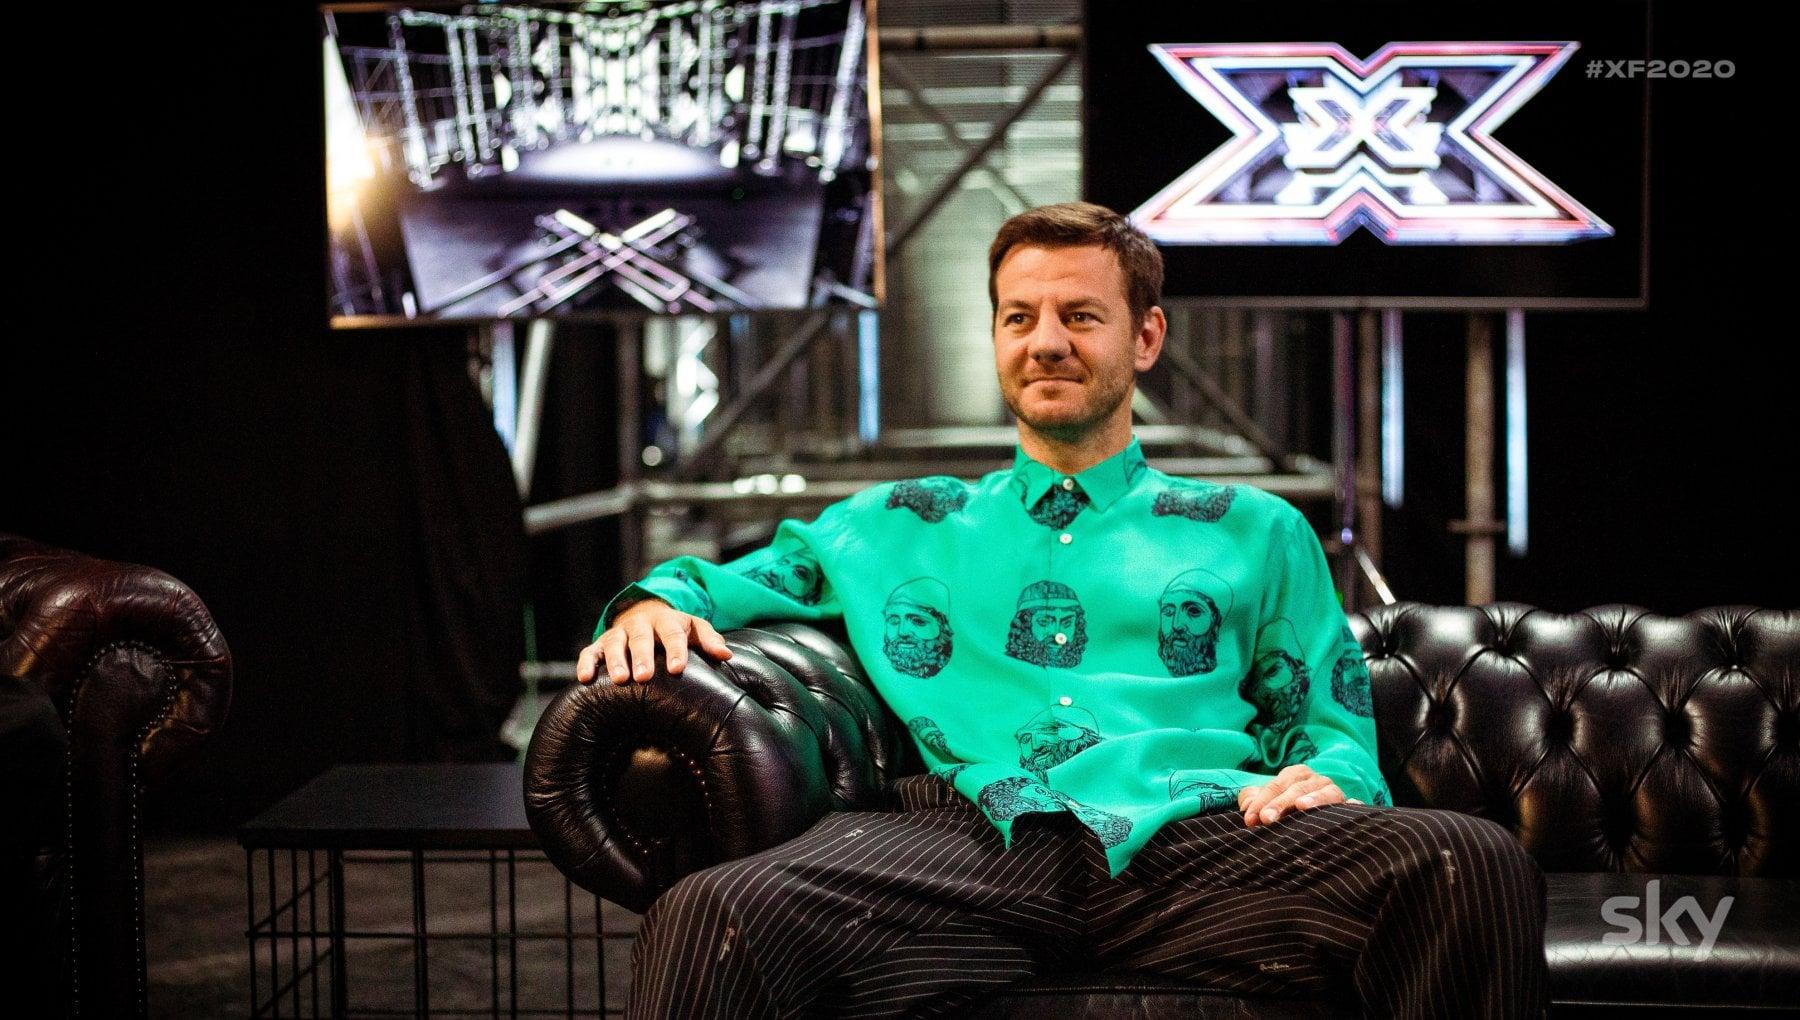 X Factor Alessandro Cattelan Sono positivo al Covid